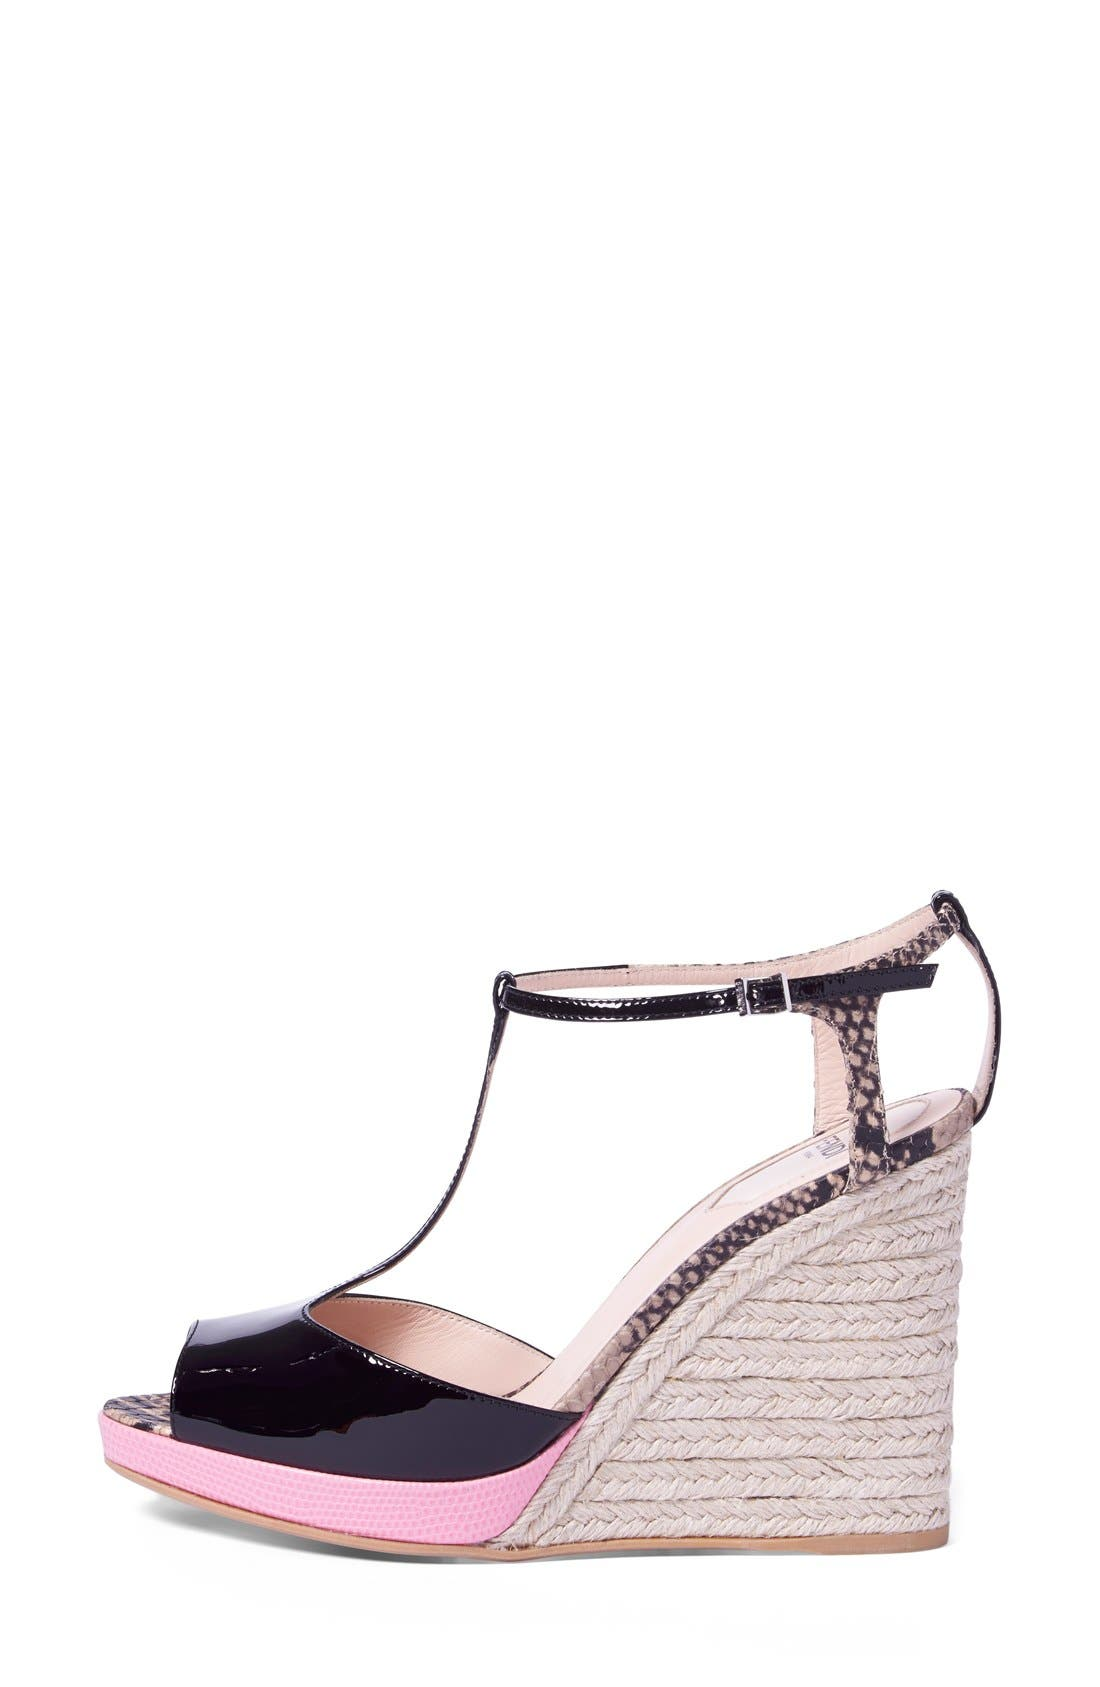 'Elodie' T-Strap Wedge Sandal,                             Alternate thumbnail 2, color,                             Black/ Pink Patent